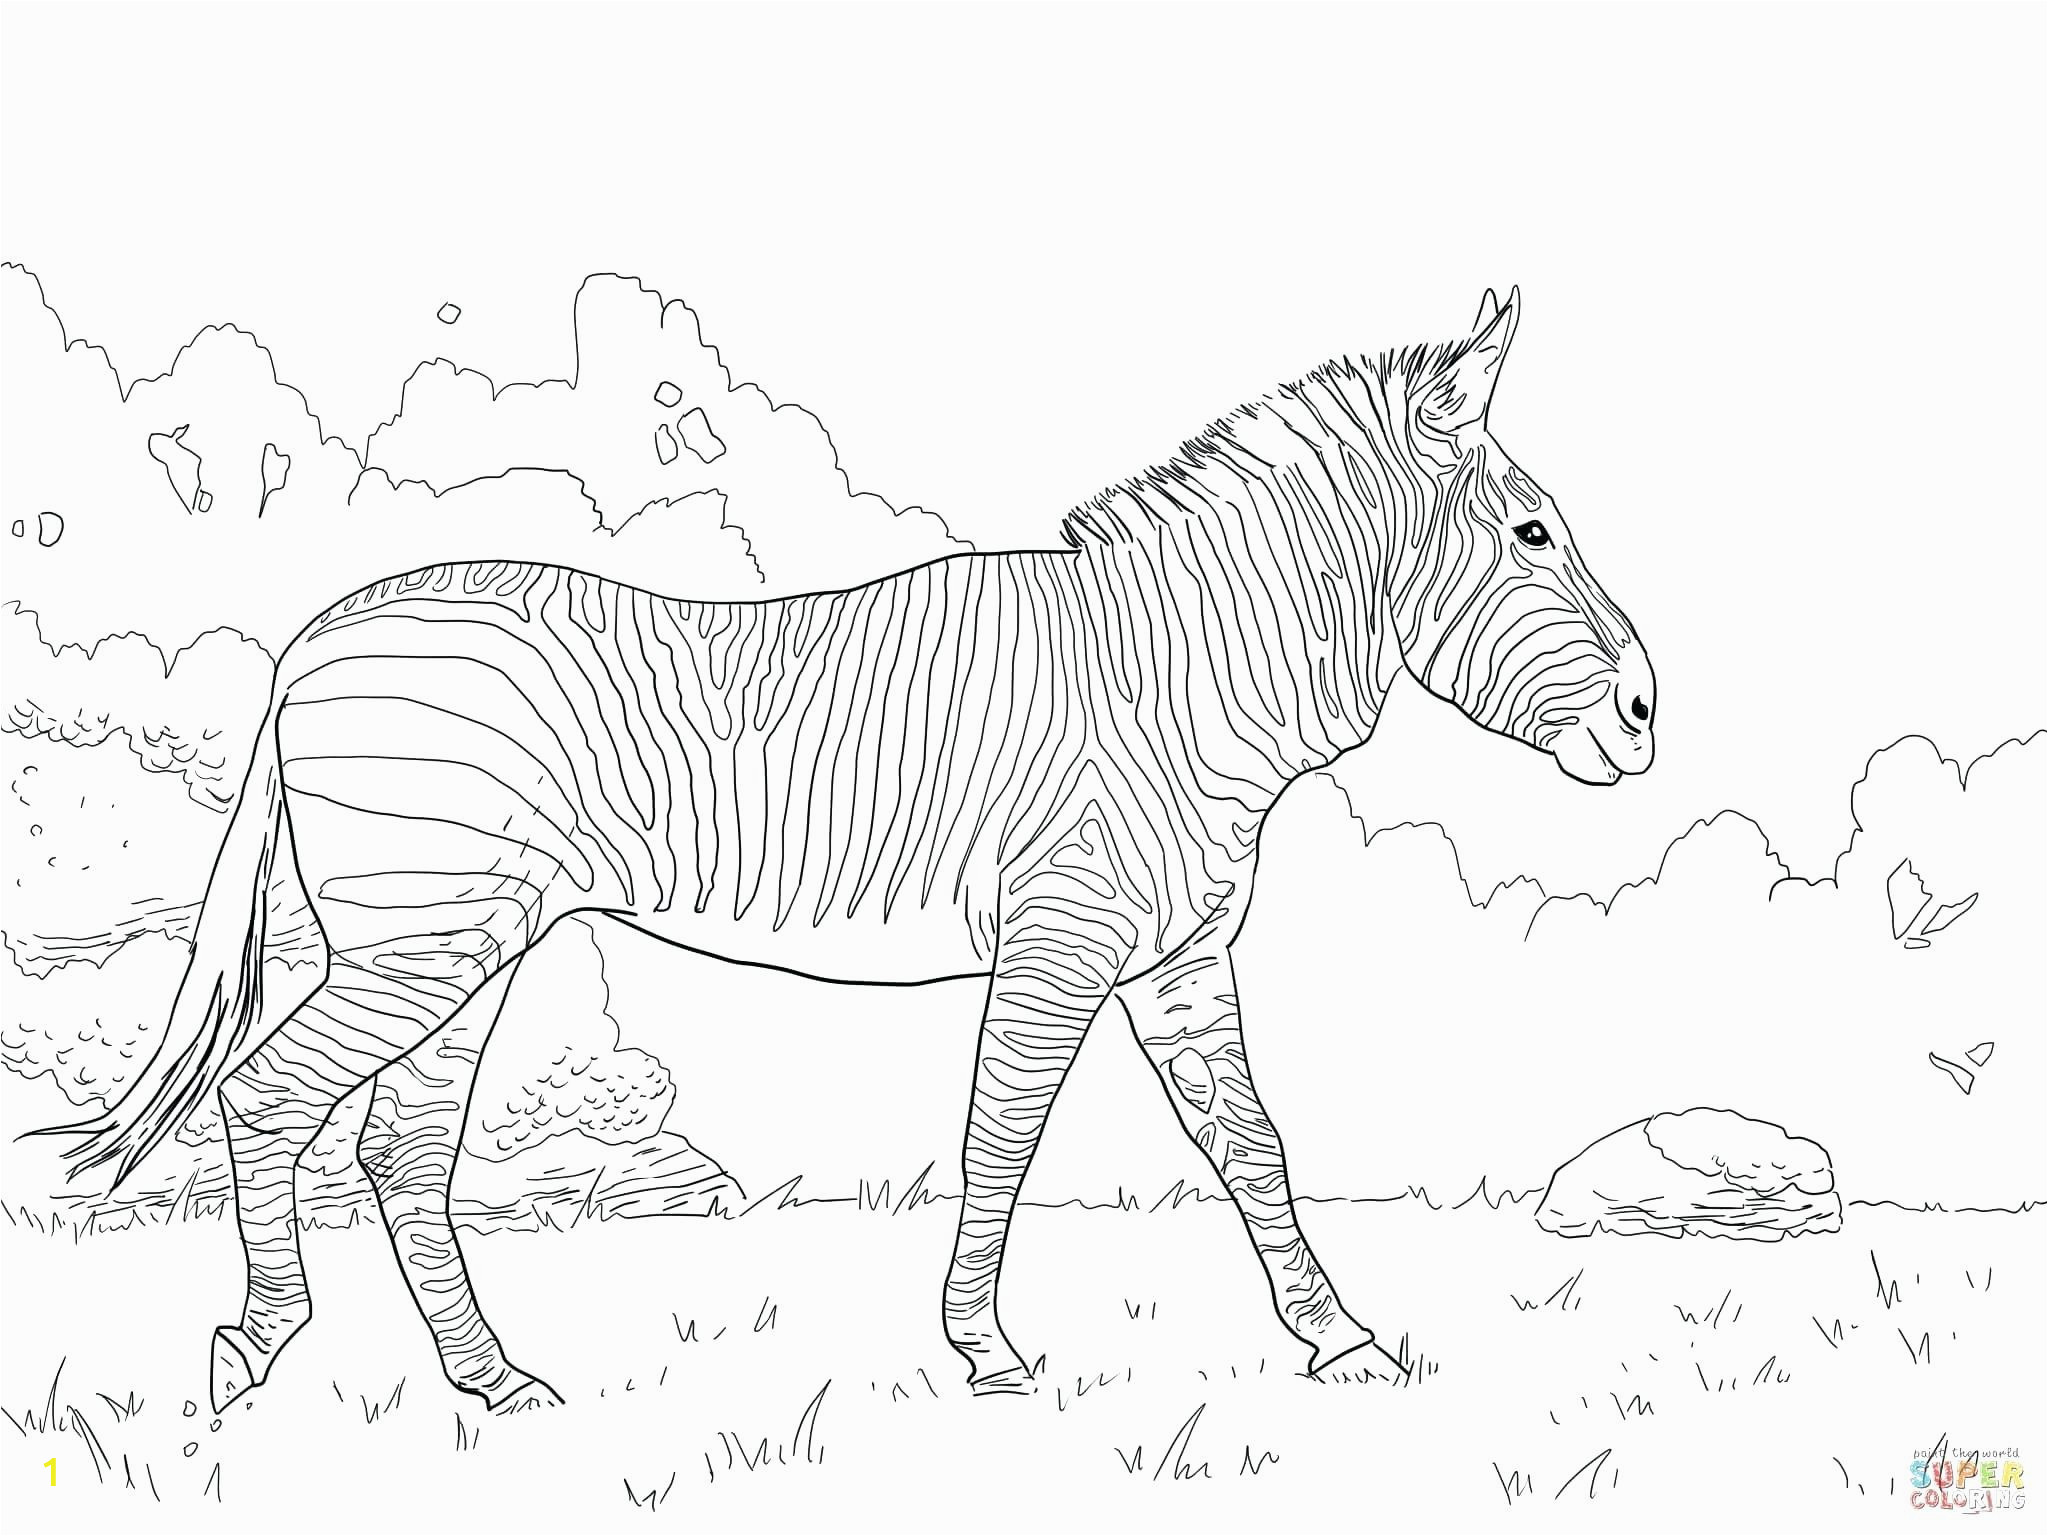 zebra animals u printable unique coloring pages for kids realistic adult books ssmotors co secret garden stress relief color by number mandala book flowers disney